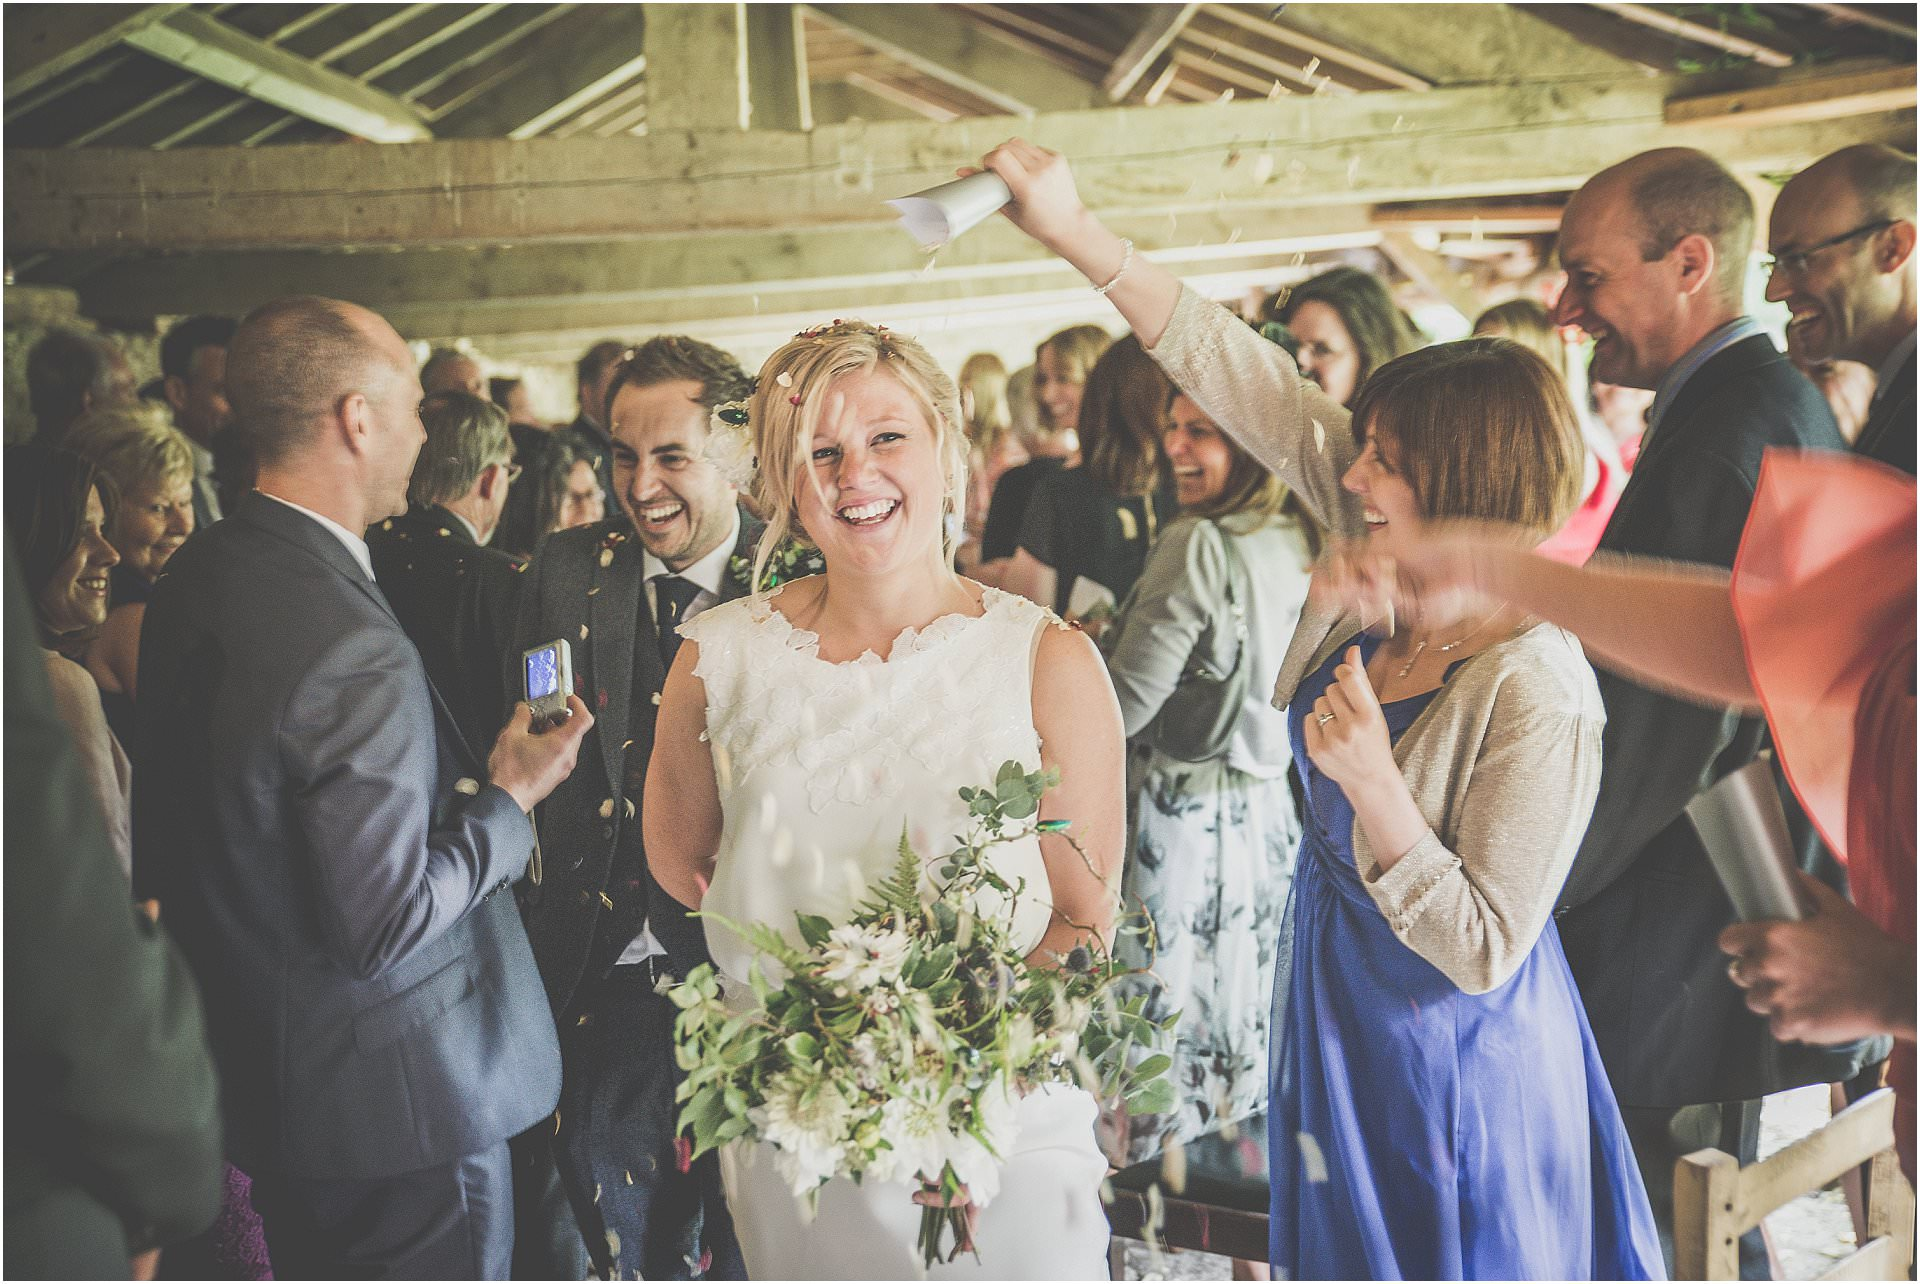 quirky artistic wedding venue West Midlands